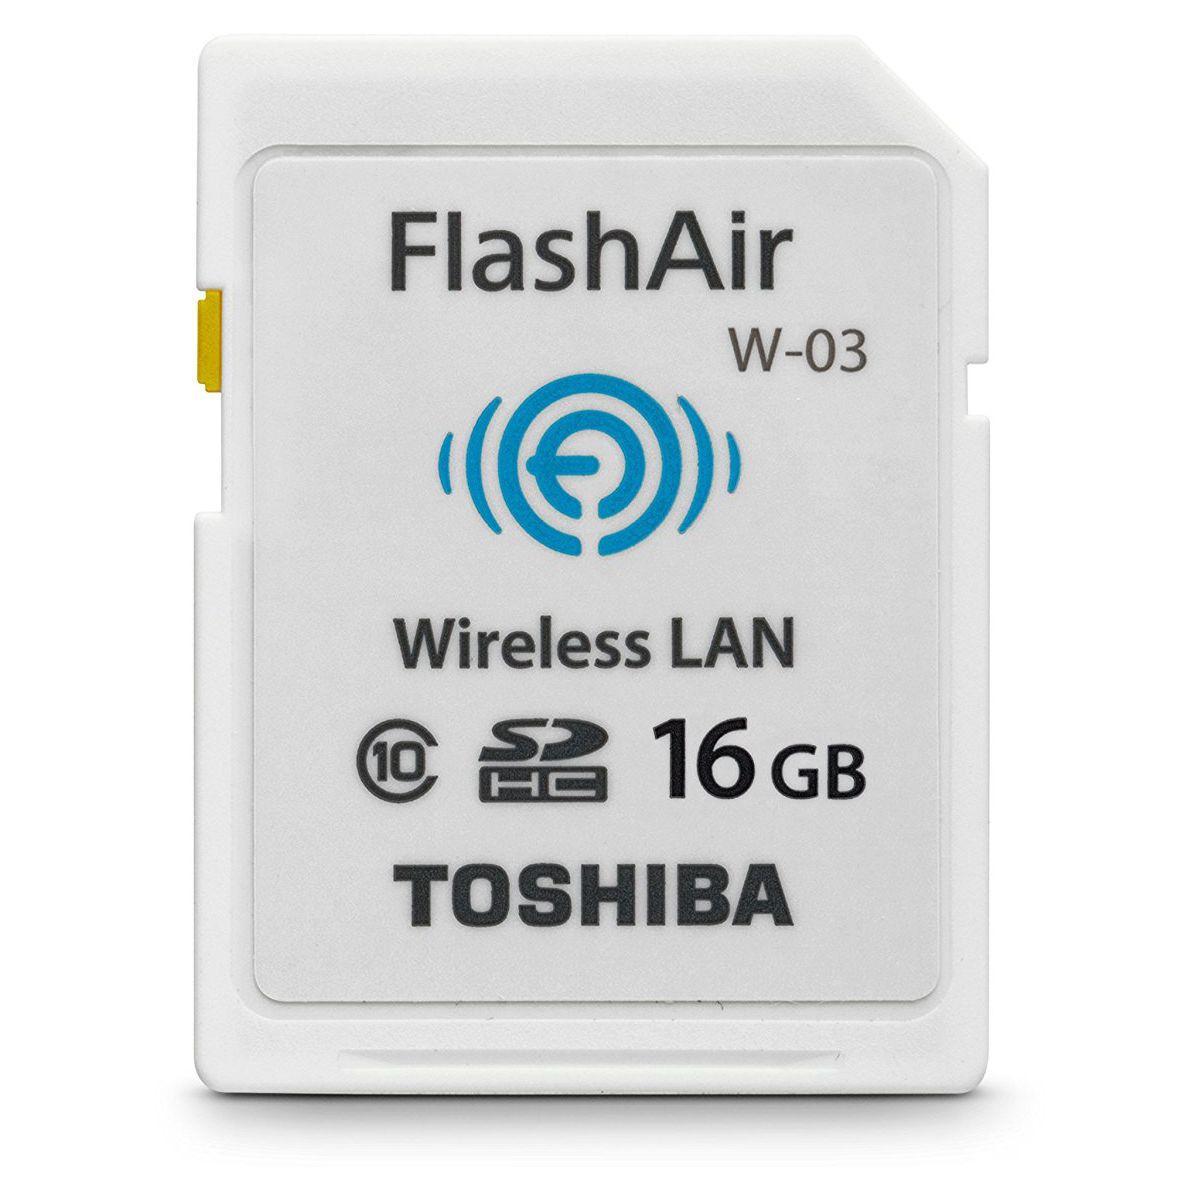 Mémoire TOSHIBA Carte SD Flash Air Wifi